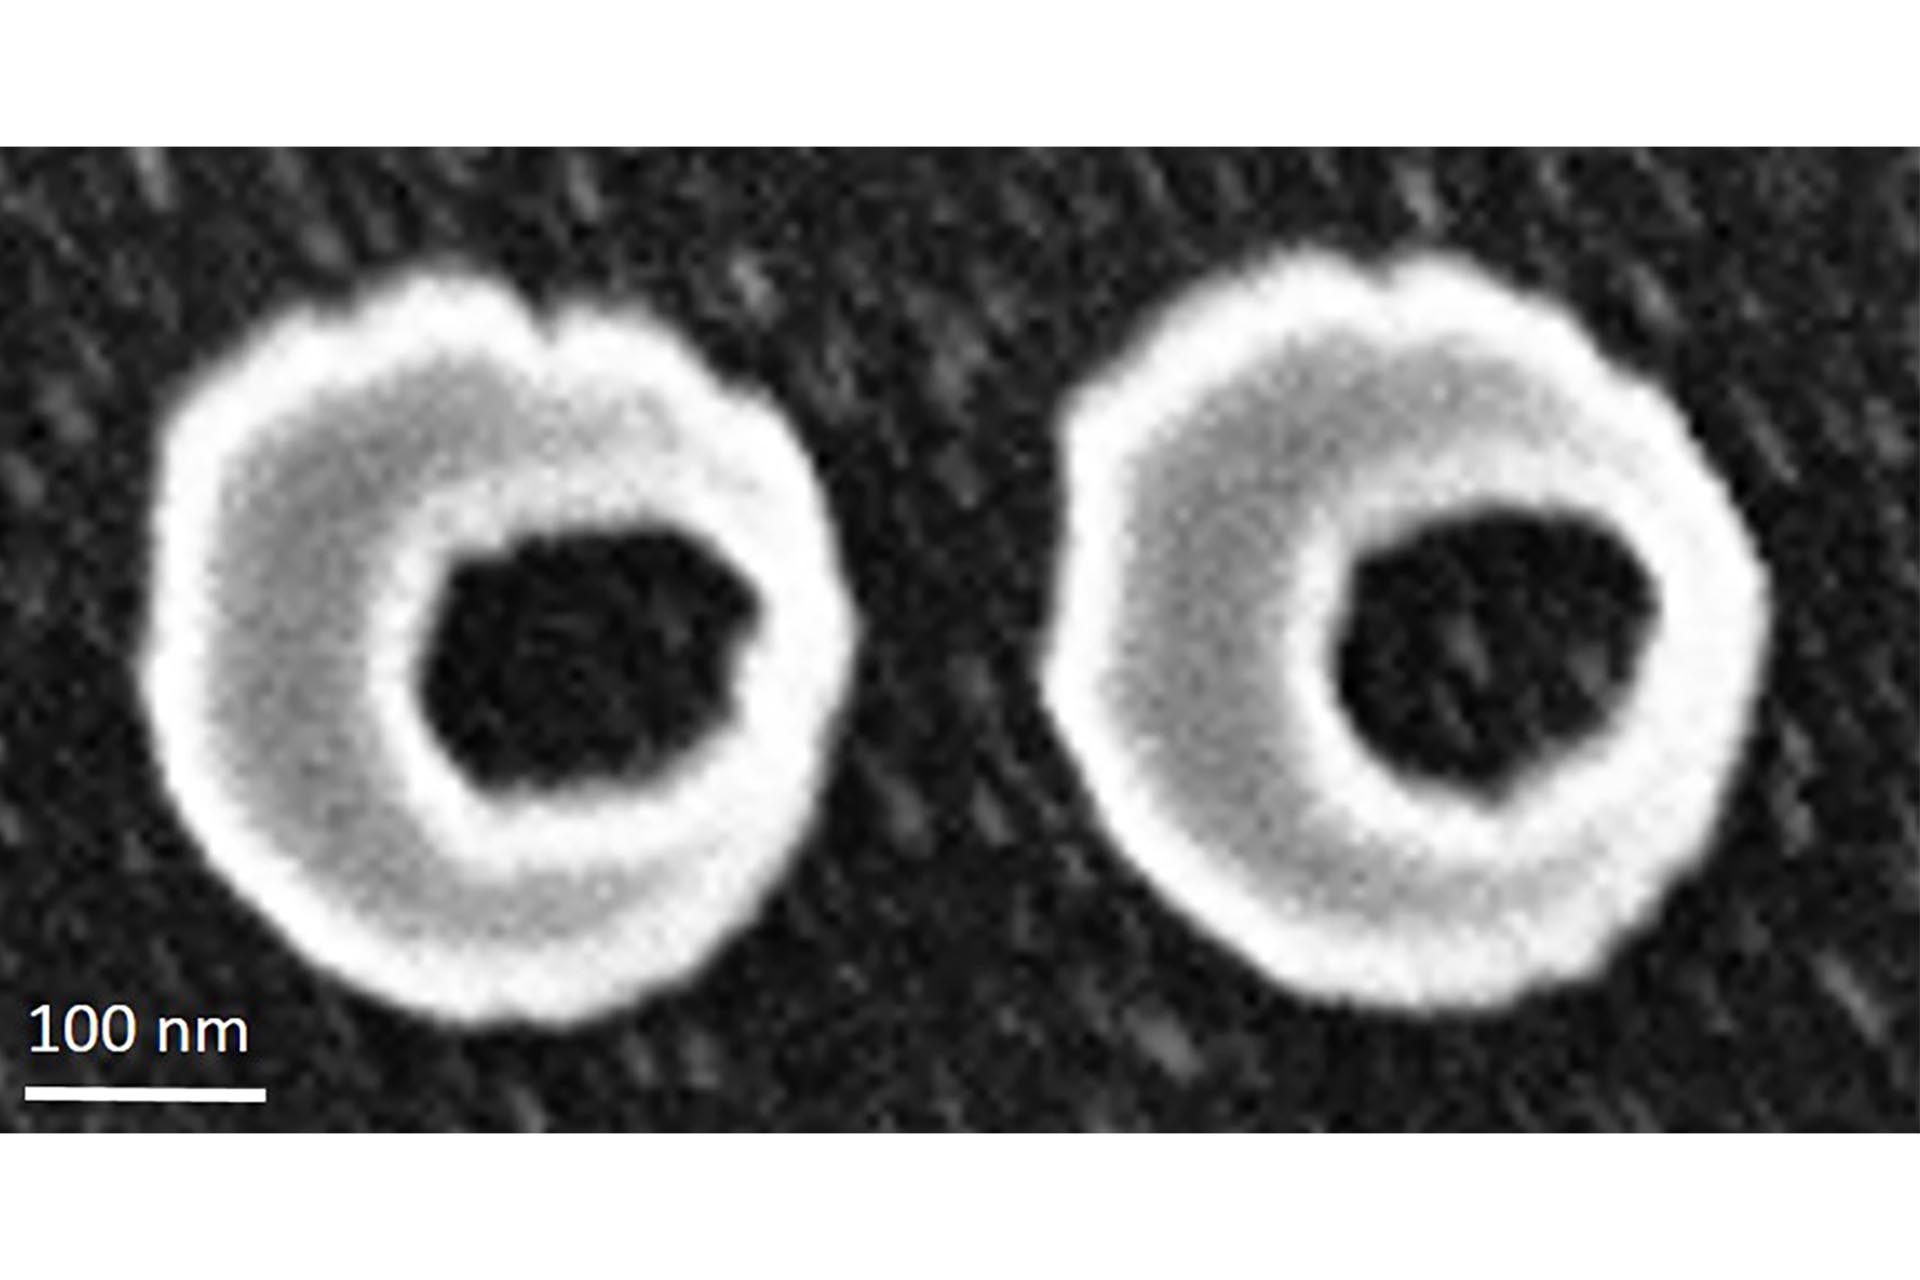 High-resolution asymmetrical rings transferred into a gold film via ion beam etching (Courtesy of Heidelberg Instruments Nano)